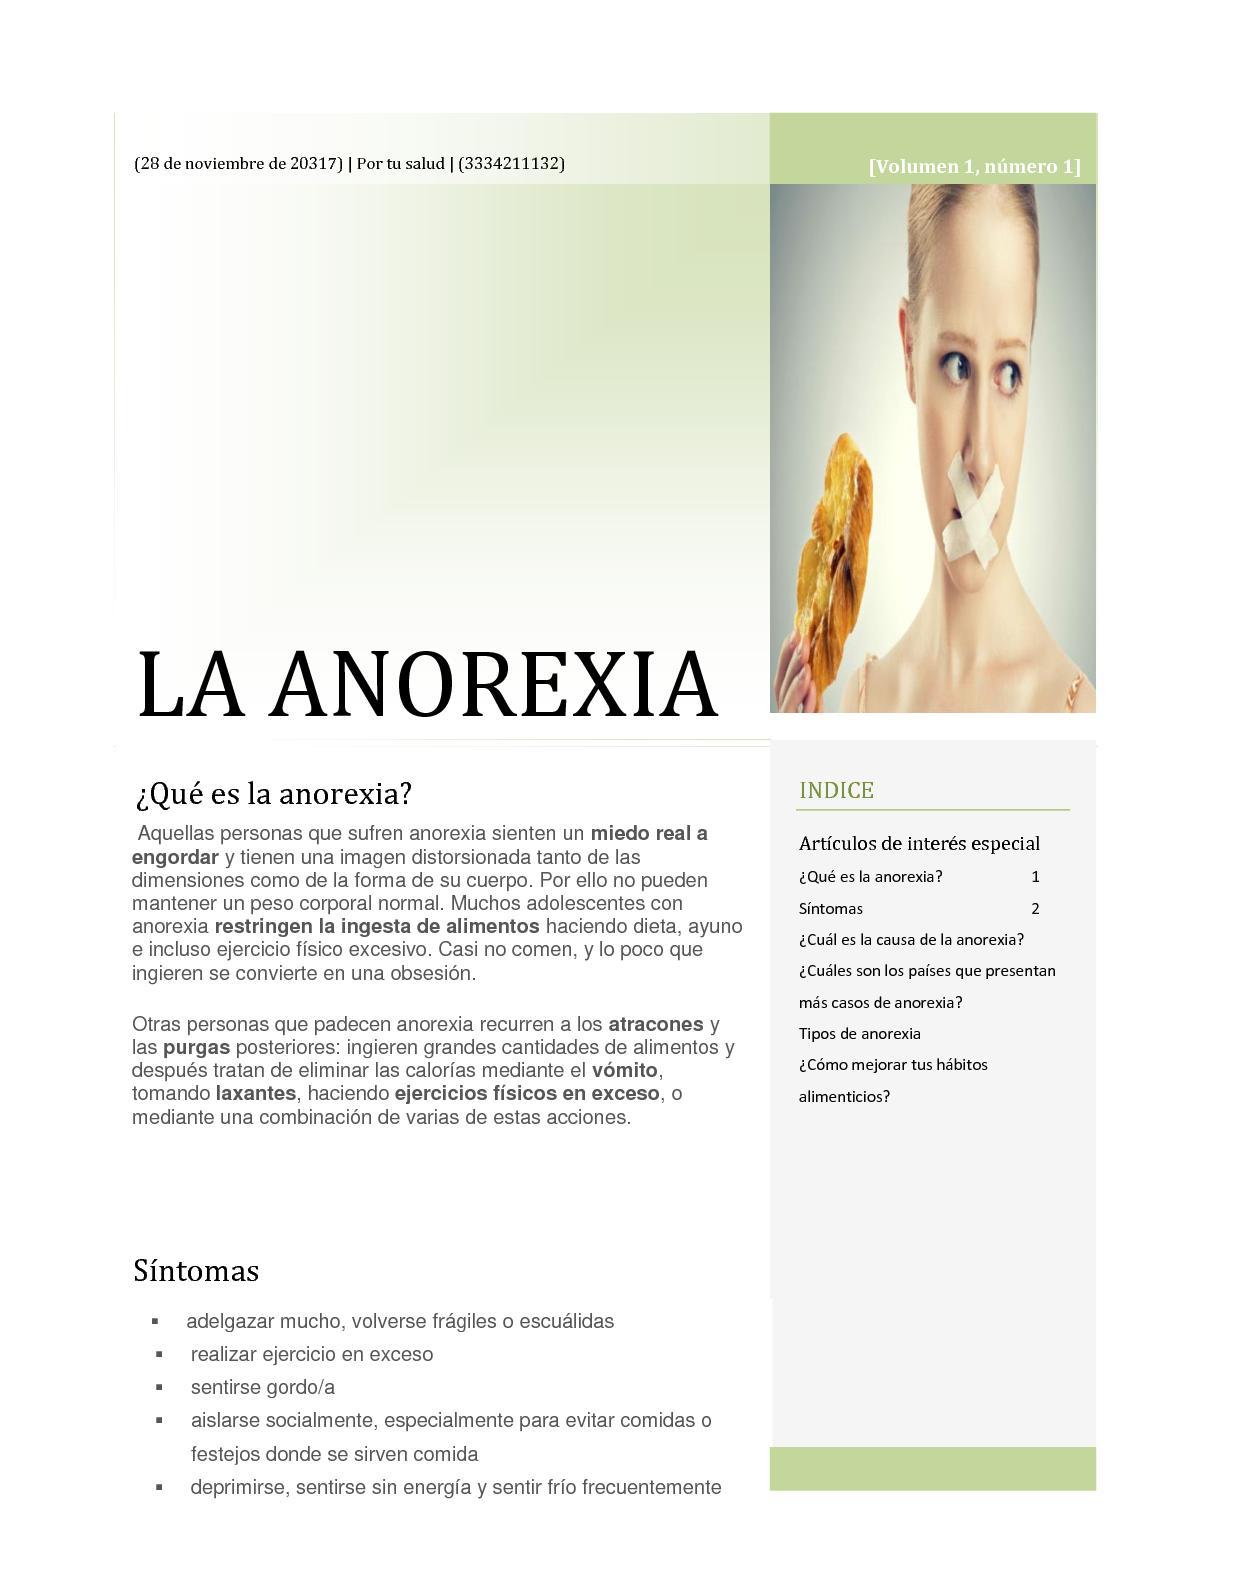 laxantes para adelgazar anorexia vs bulimia